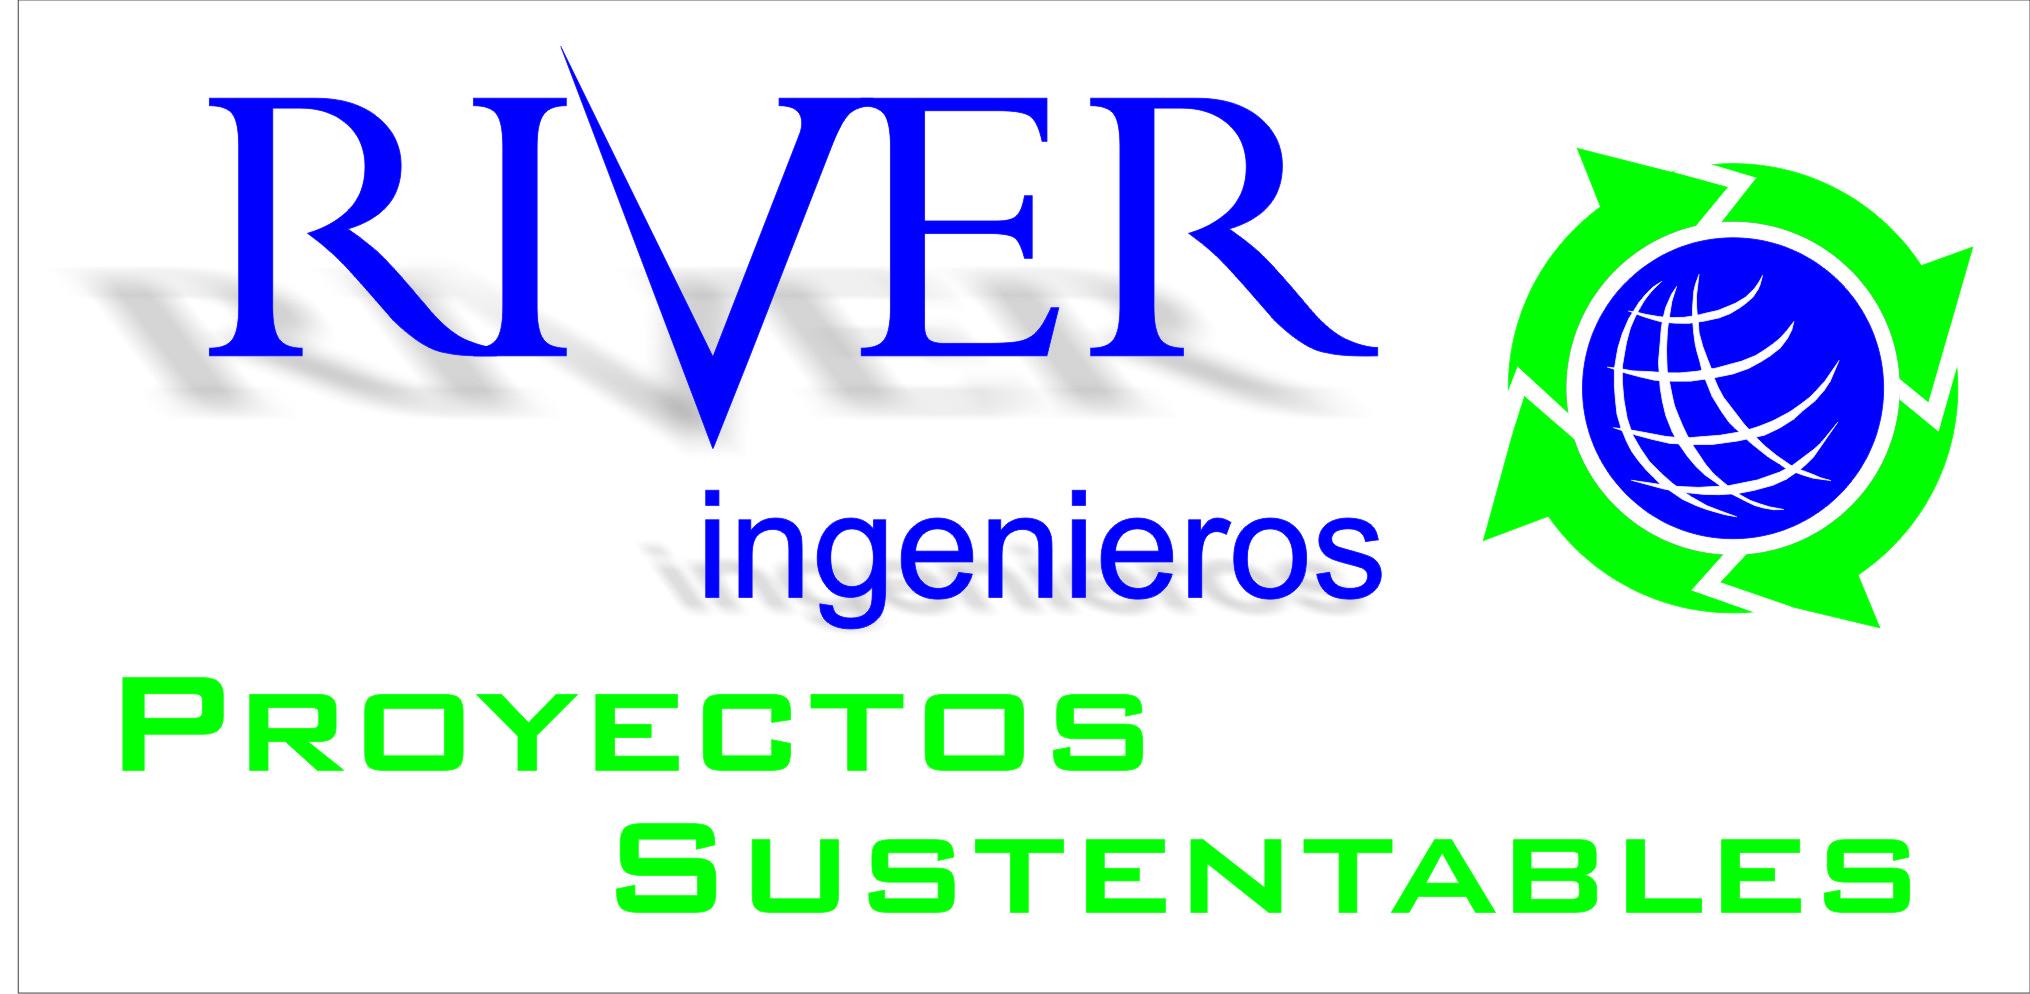 River Ingenieros